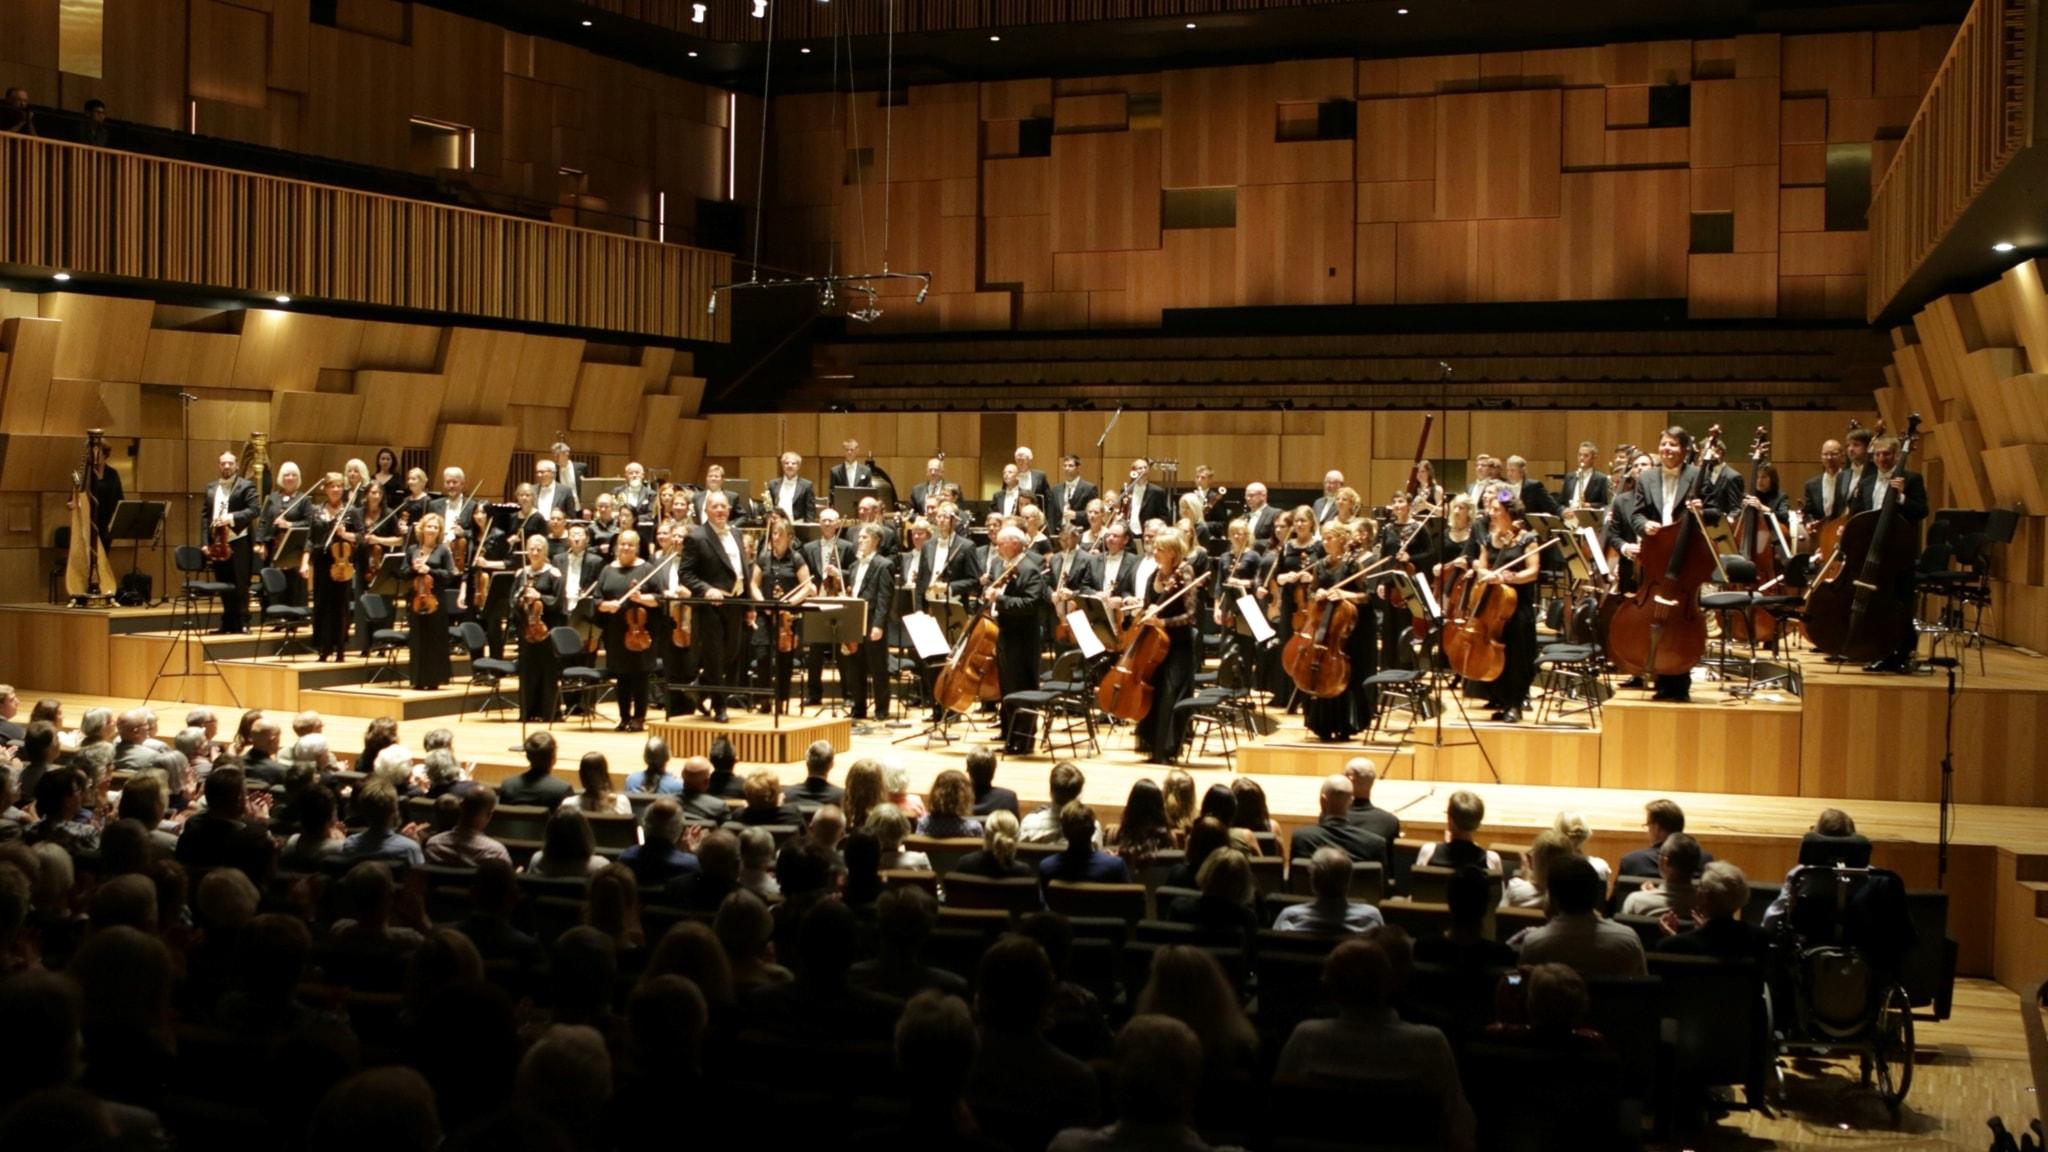 KONSERT: Sjostakovitjs 8:a med Malmö symfoniorkester